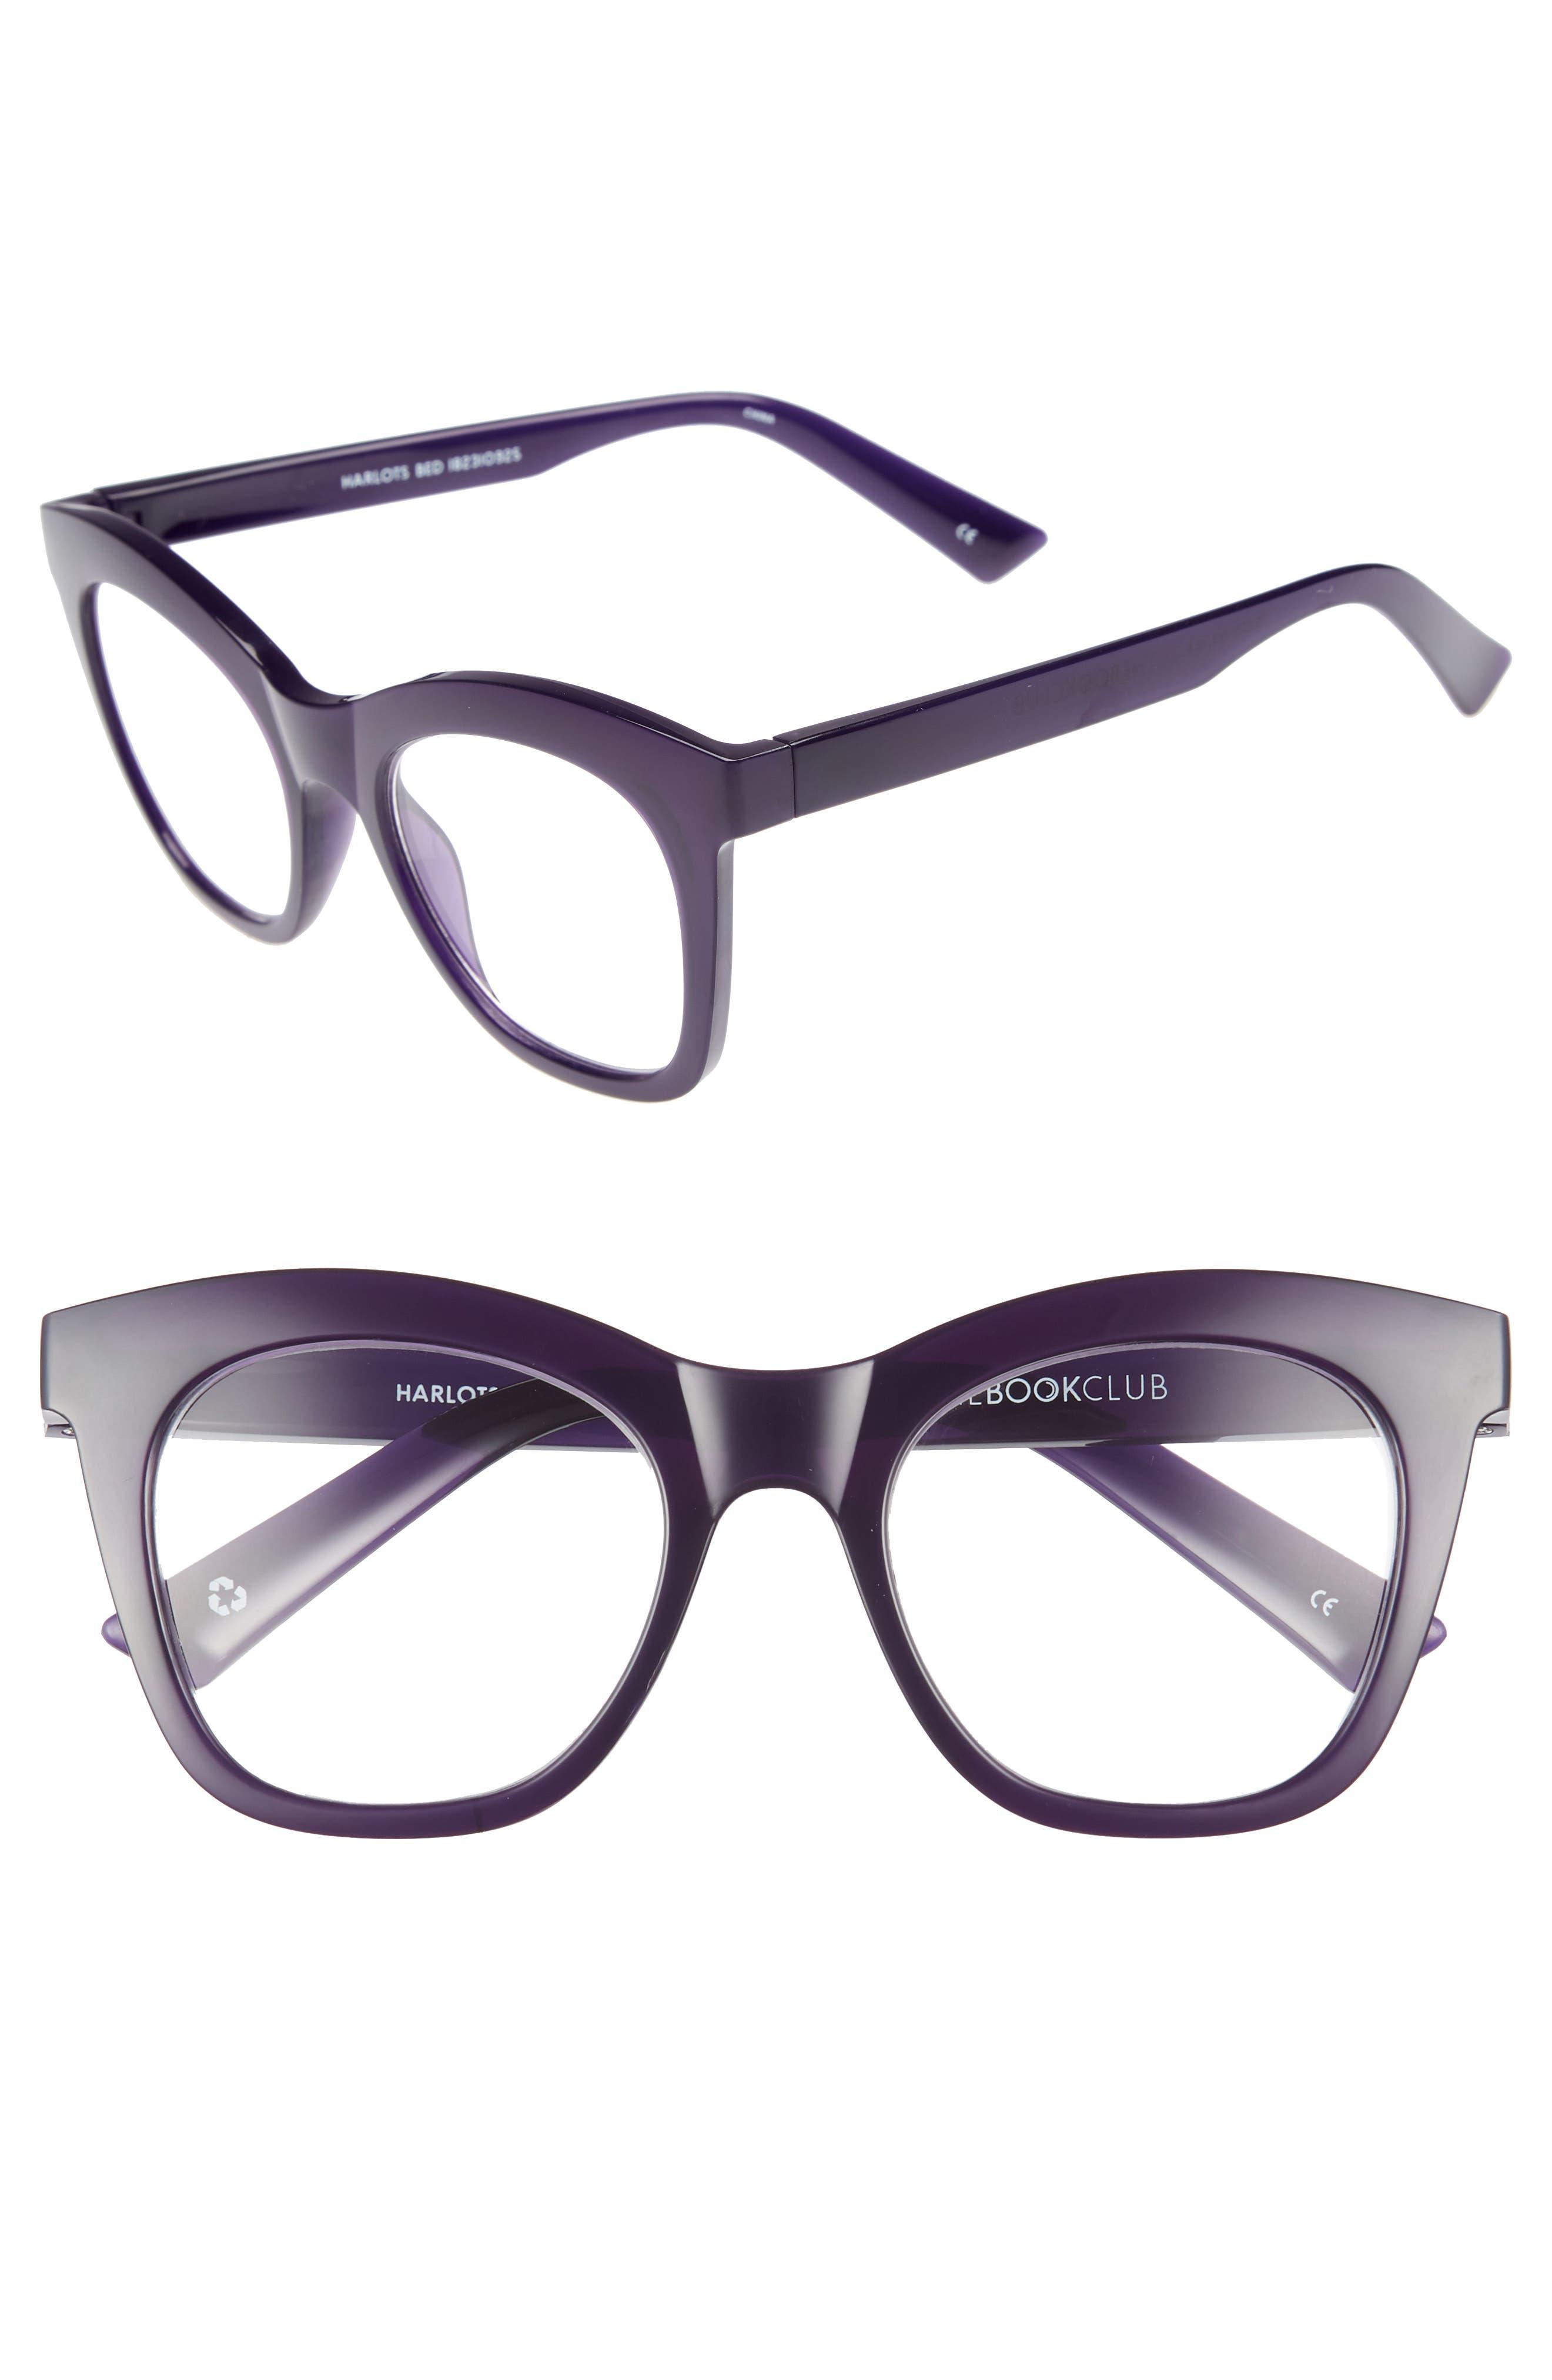 Harlot's Bed 51mm Reading Glasses,                         Main,                         color, Deep Purple